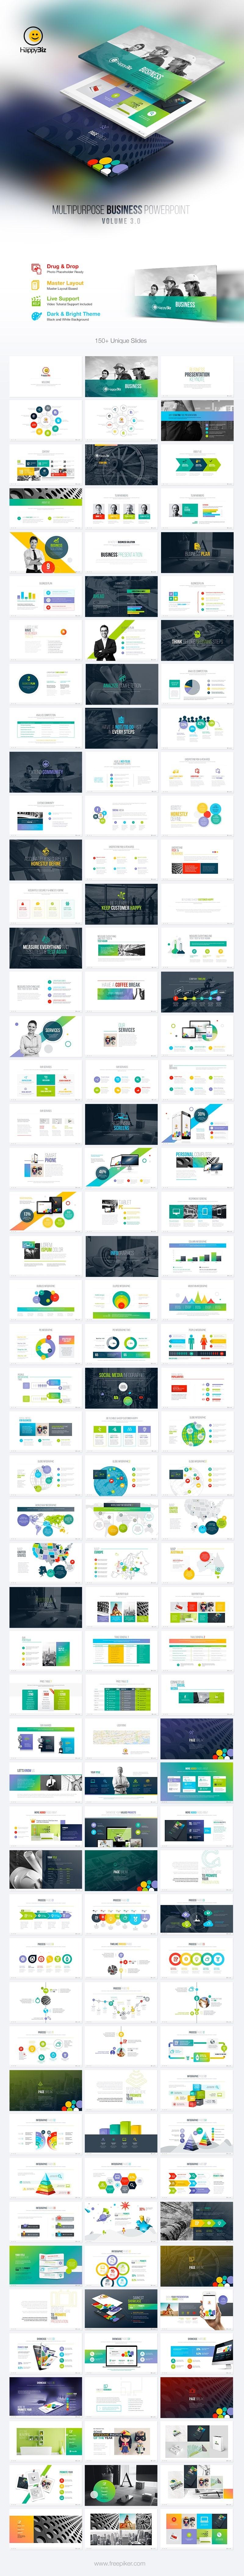 HappyBiz Multipurpose Business PowerPoint